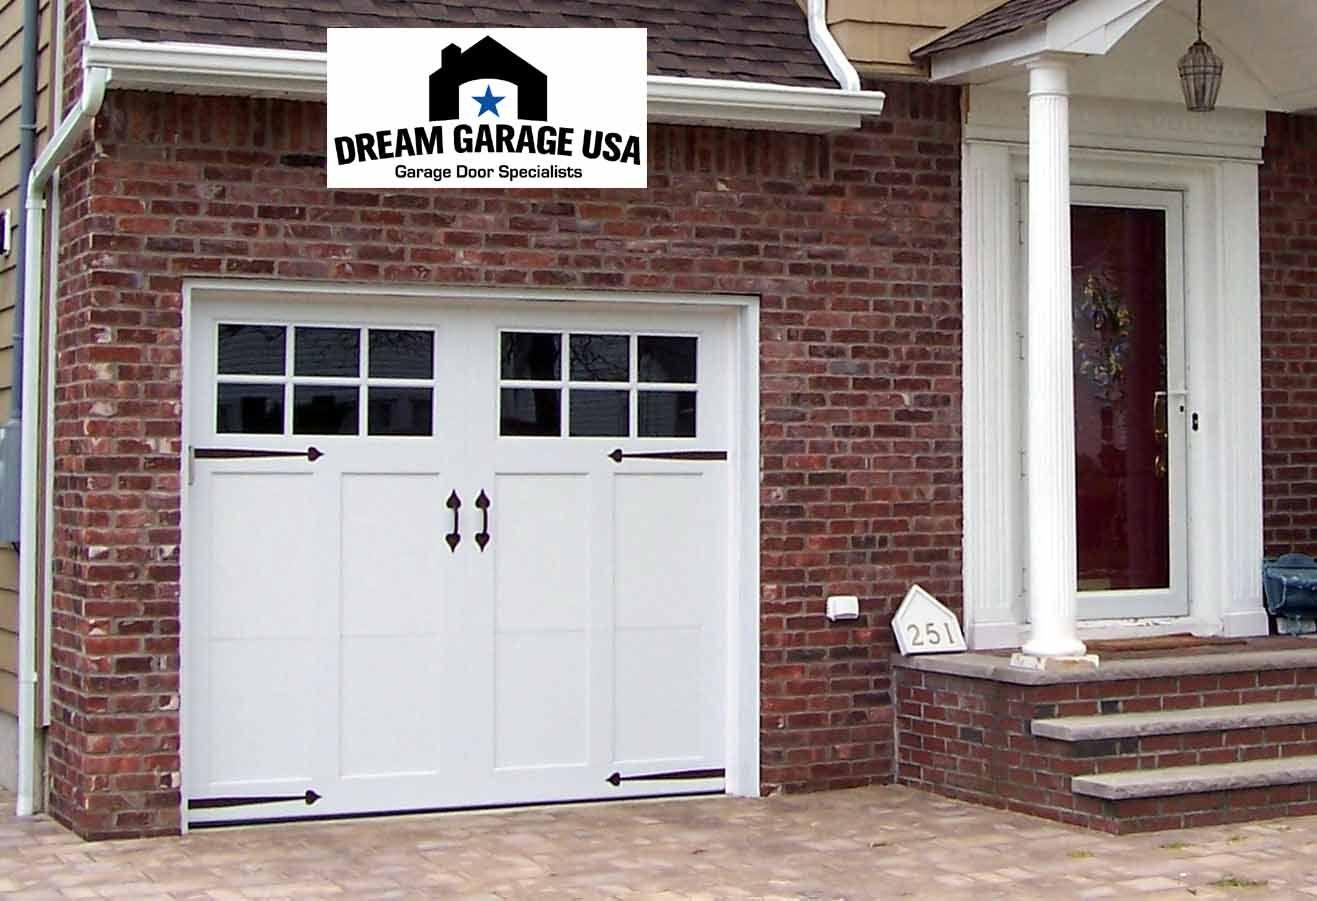 Carriage house style garage doors http://www.wayne-dalton.com ...